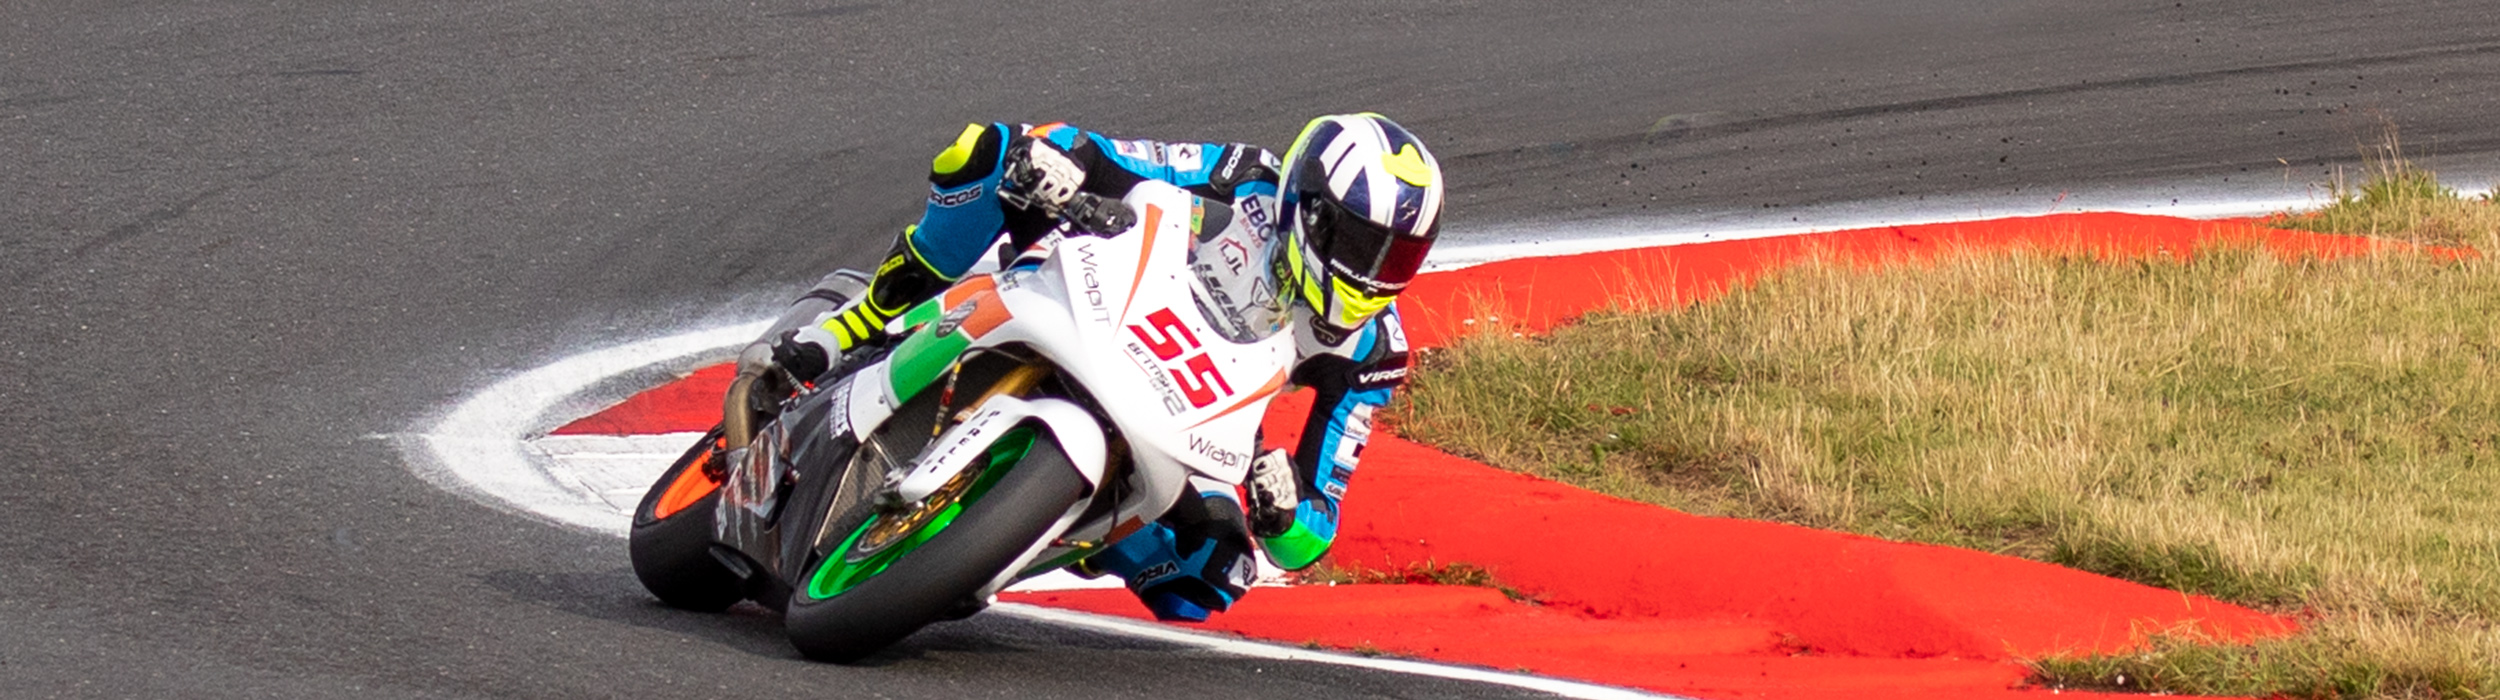 Harris GP2